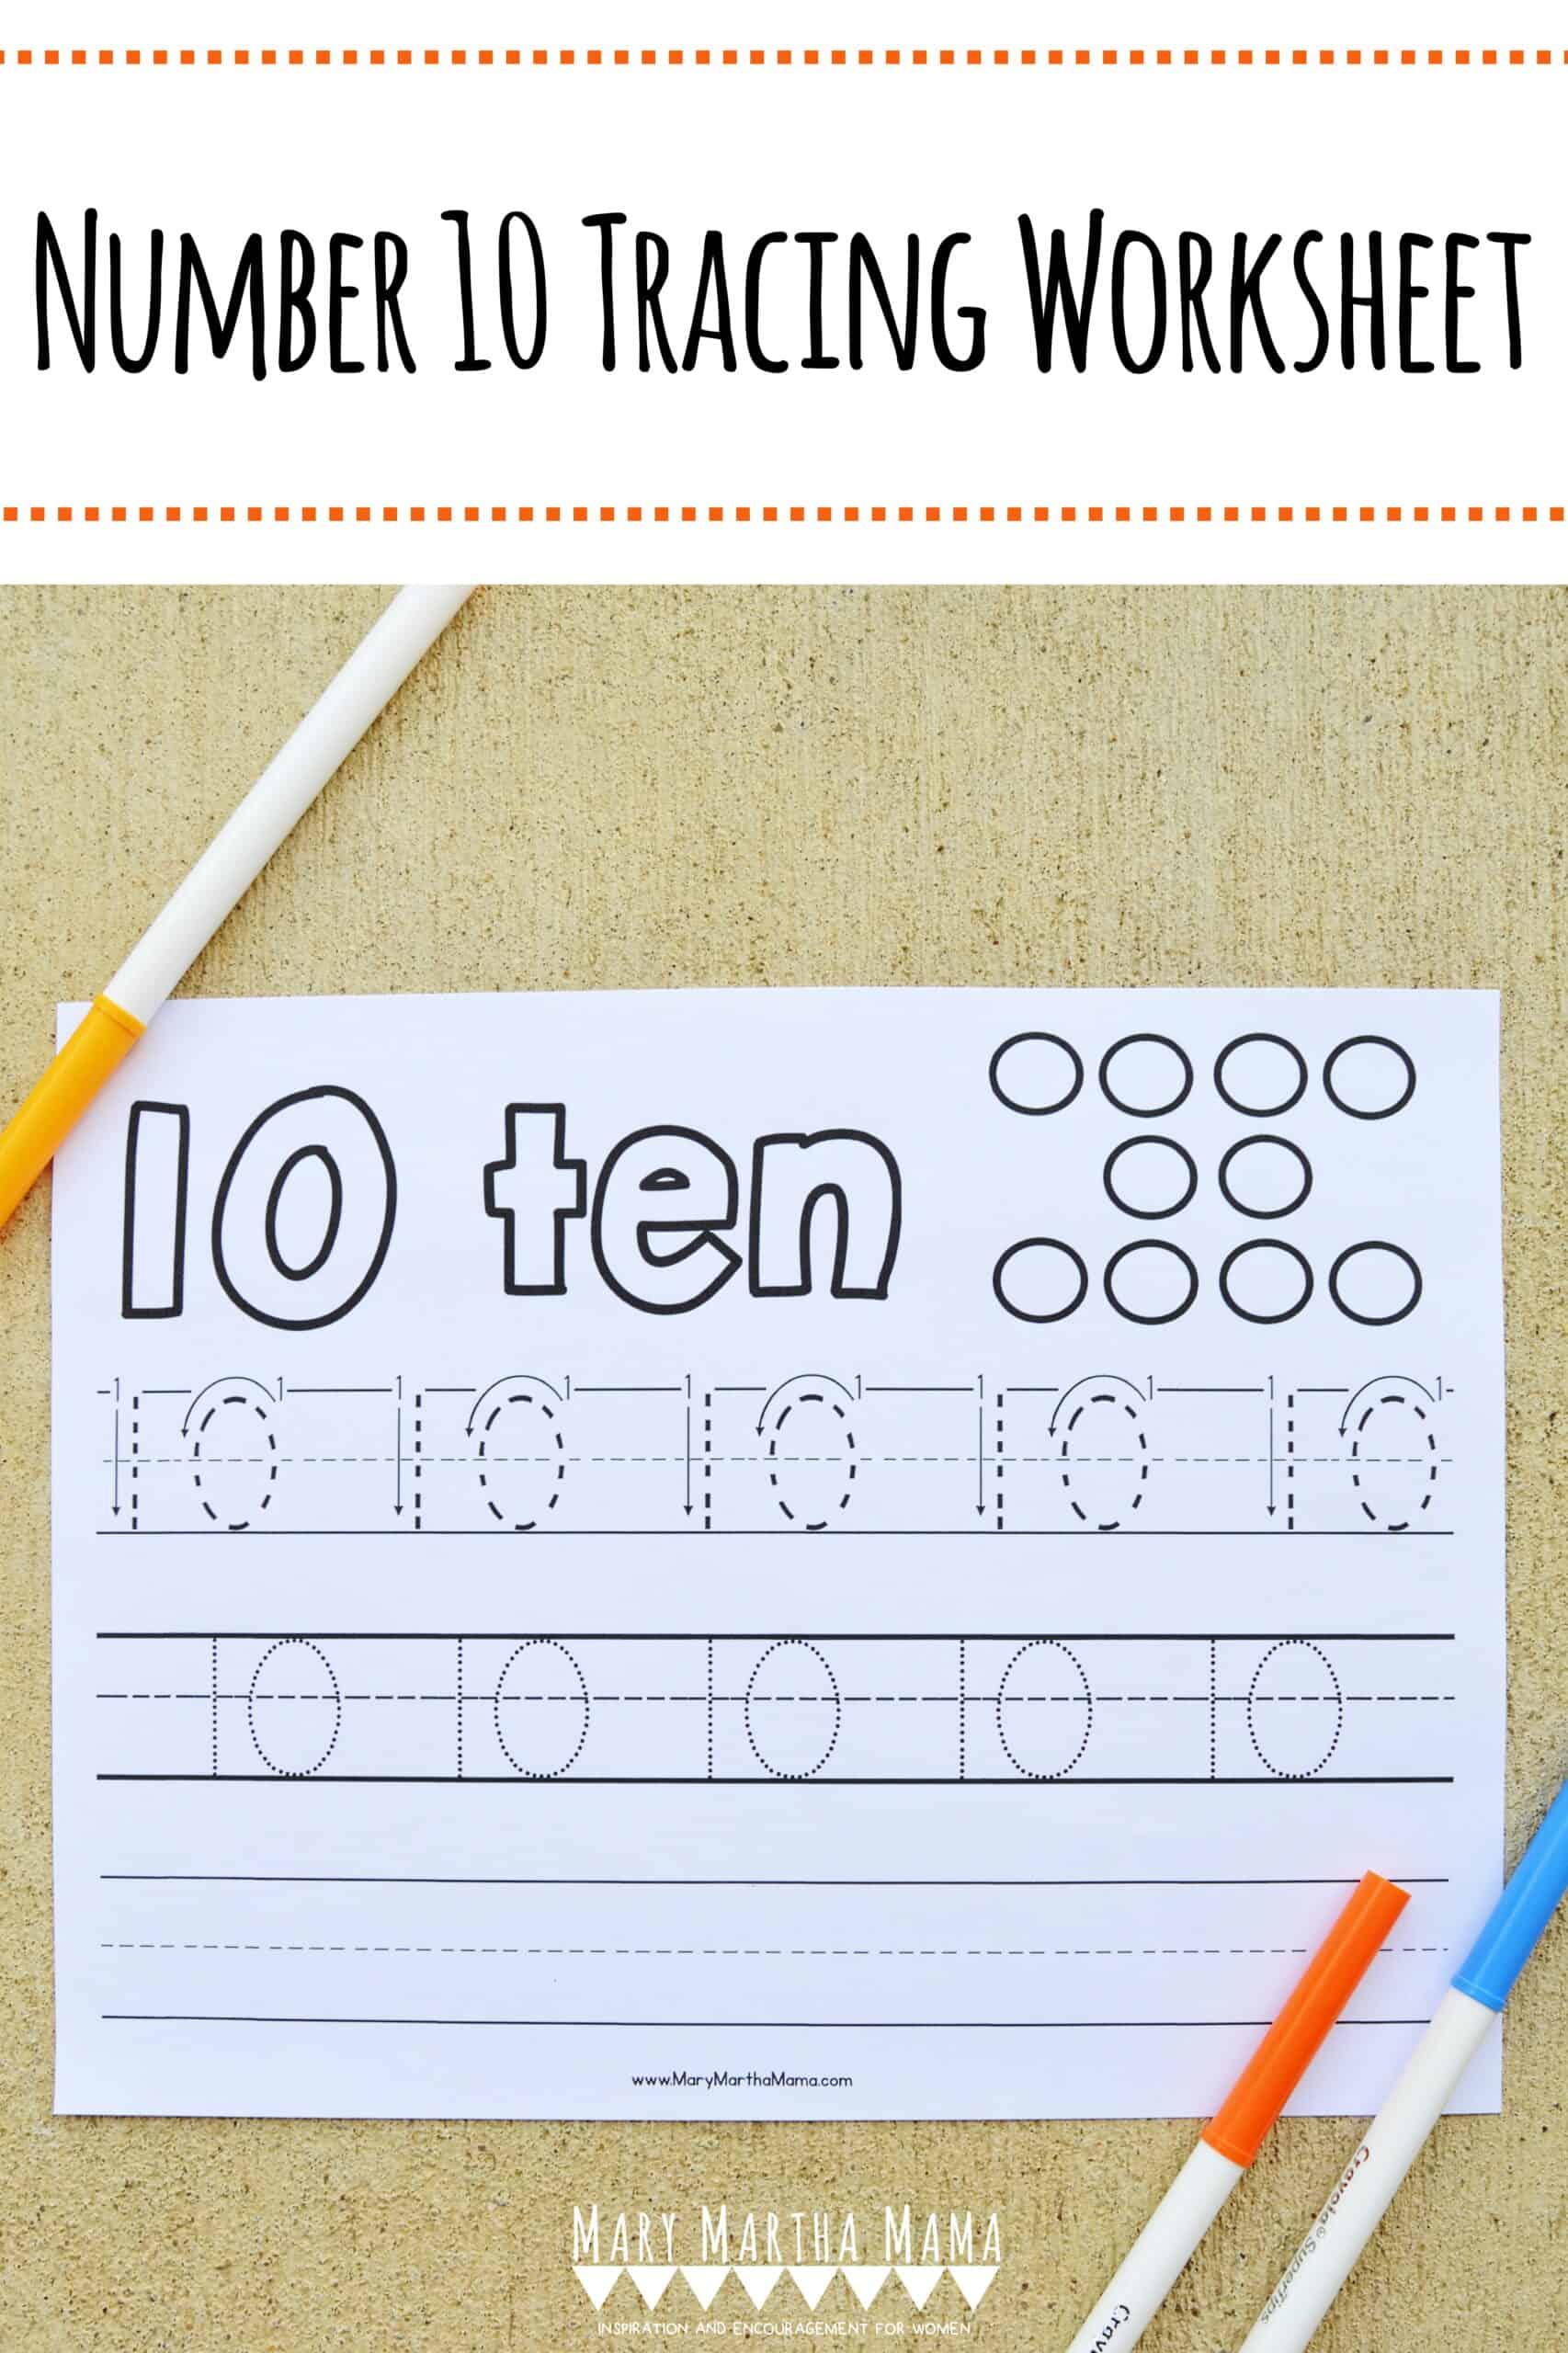 Number 10 Tracing Worksheet Mary Martha Mama